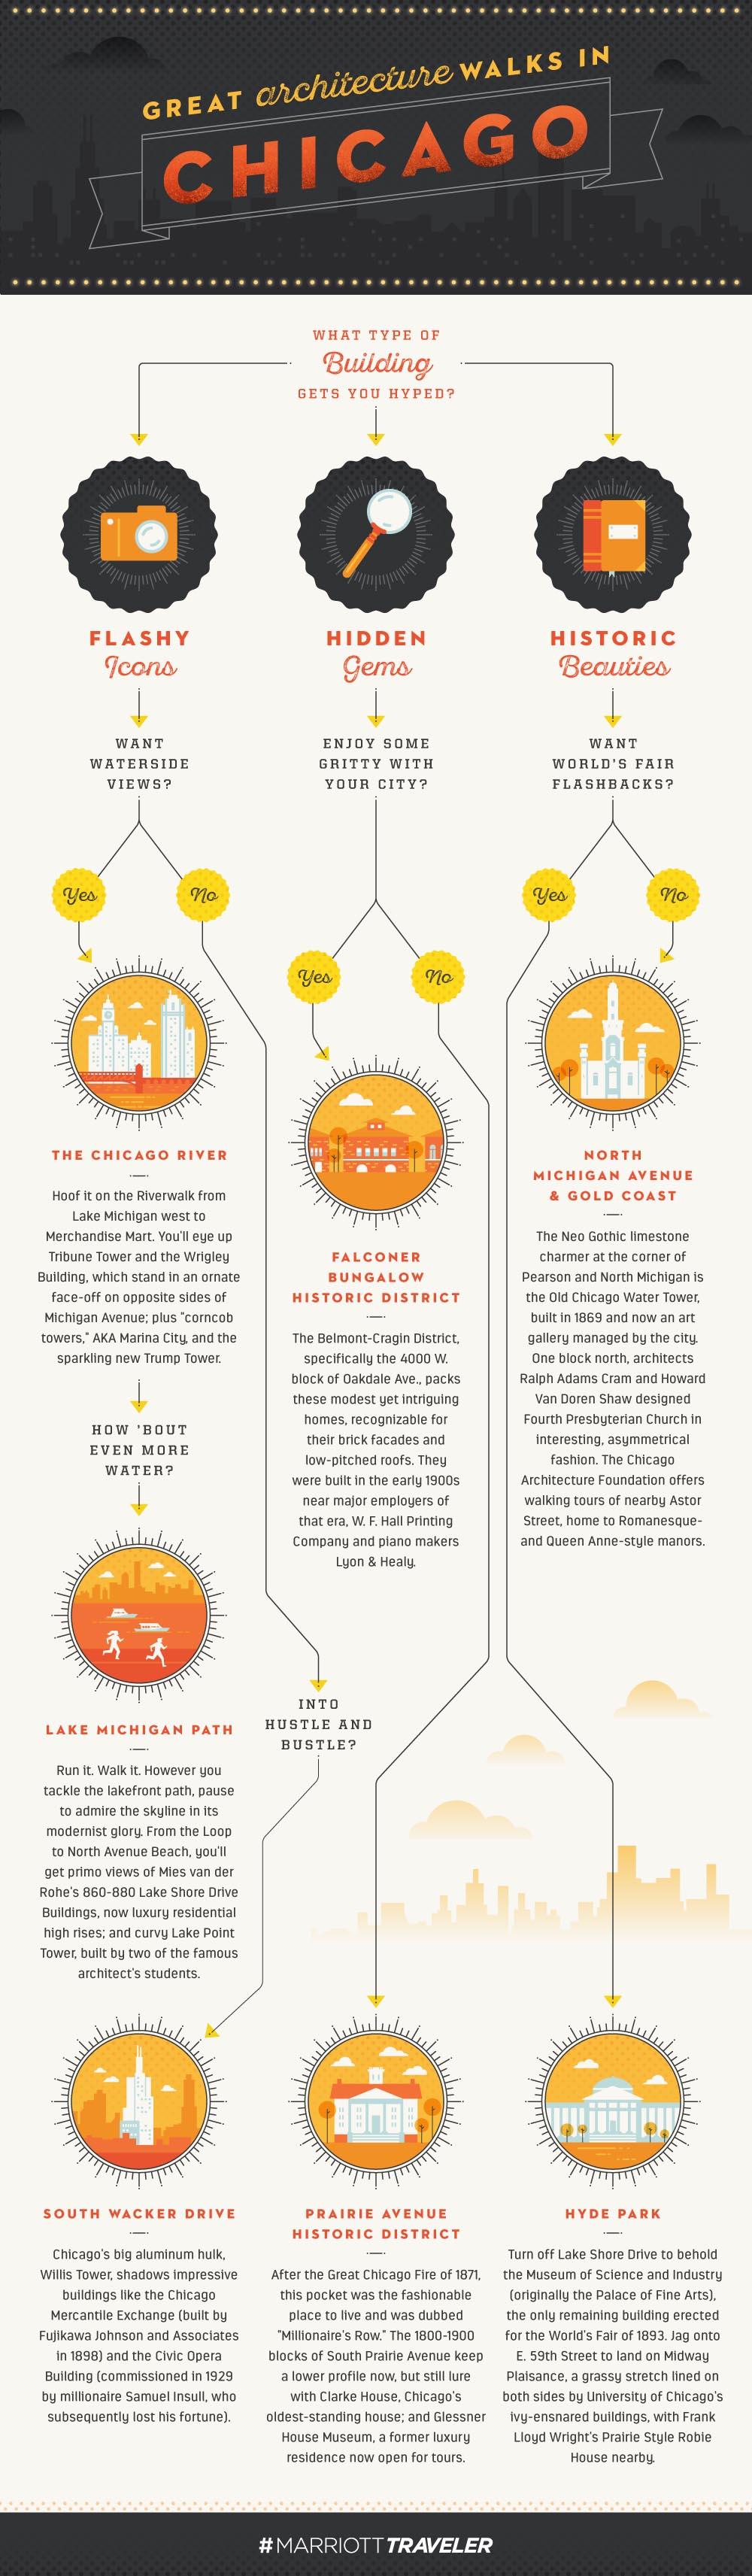 chicago-architecture-walk-infographic-main.jpg